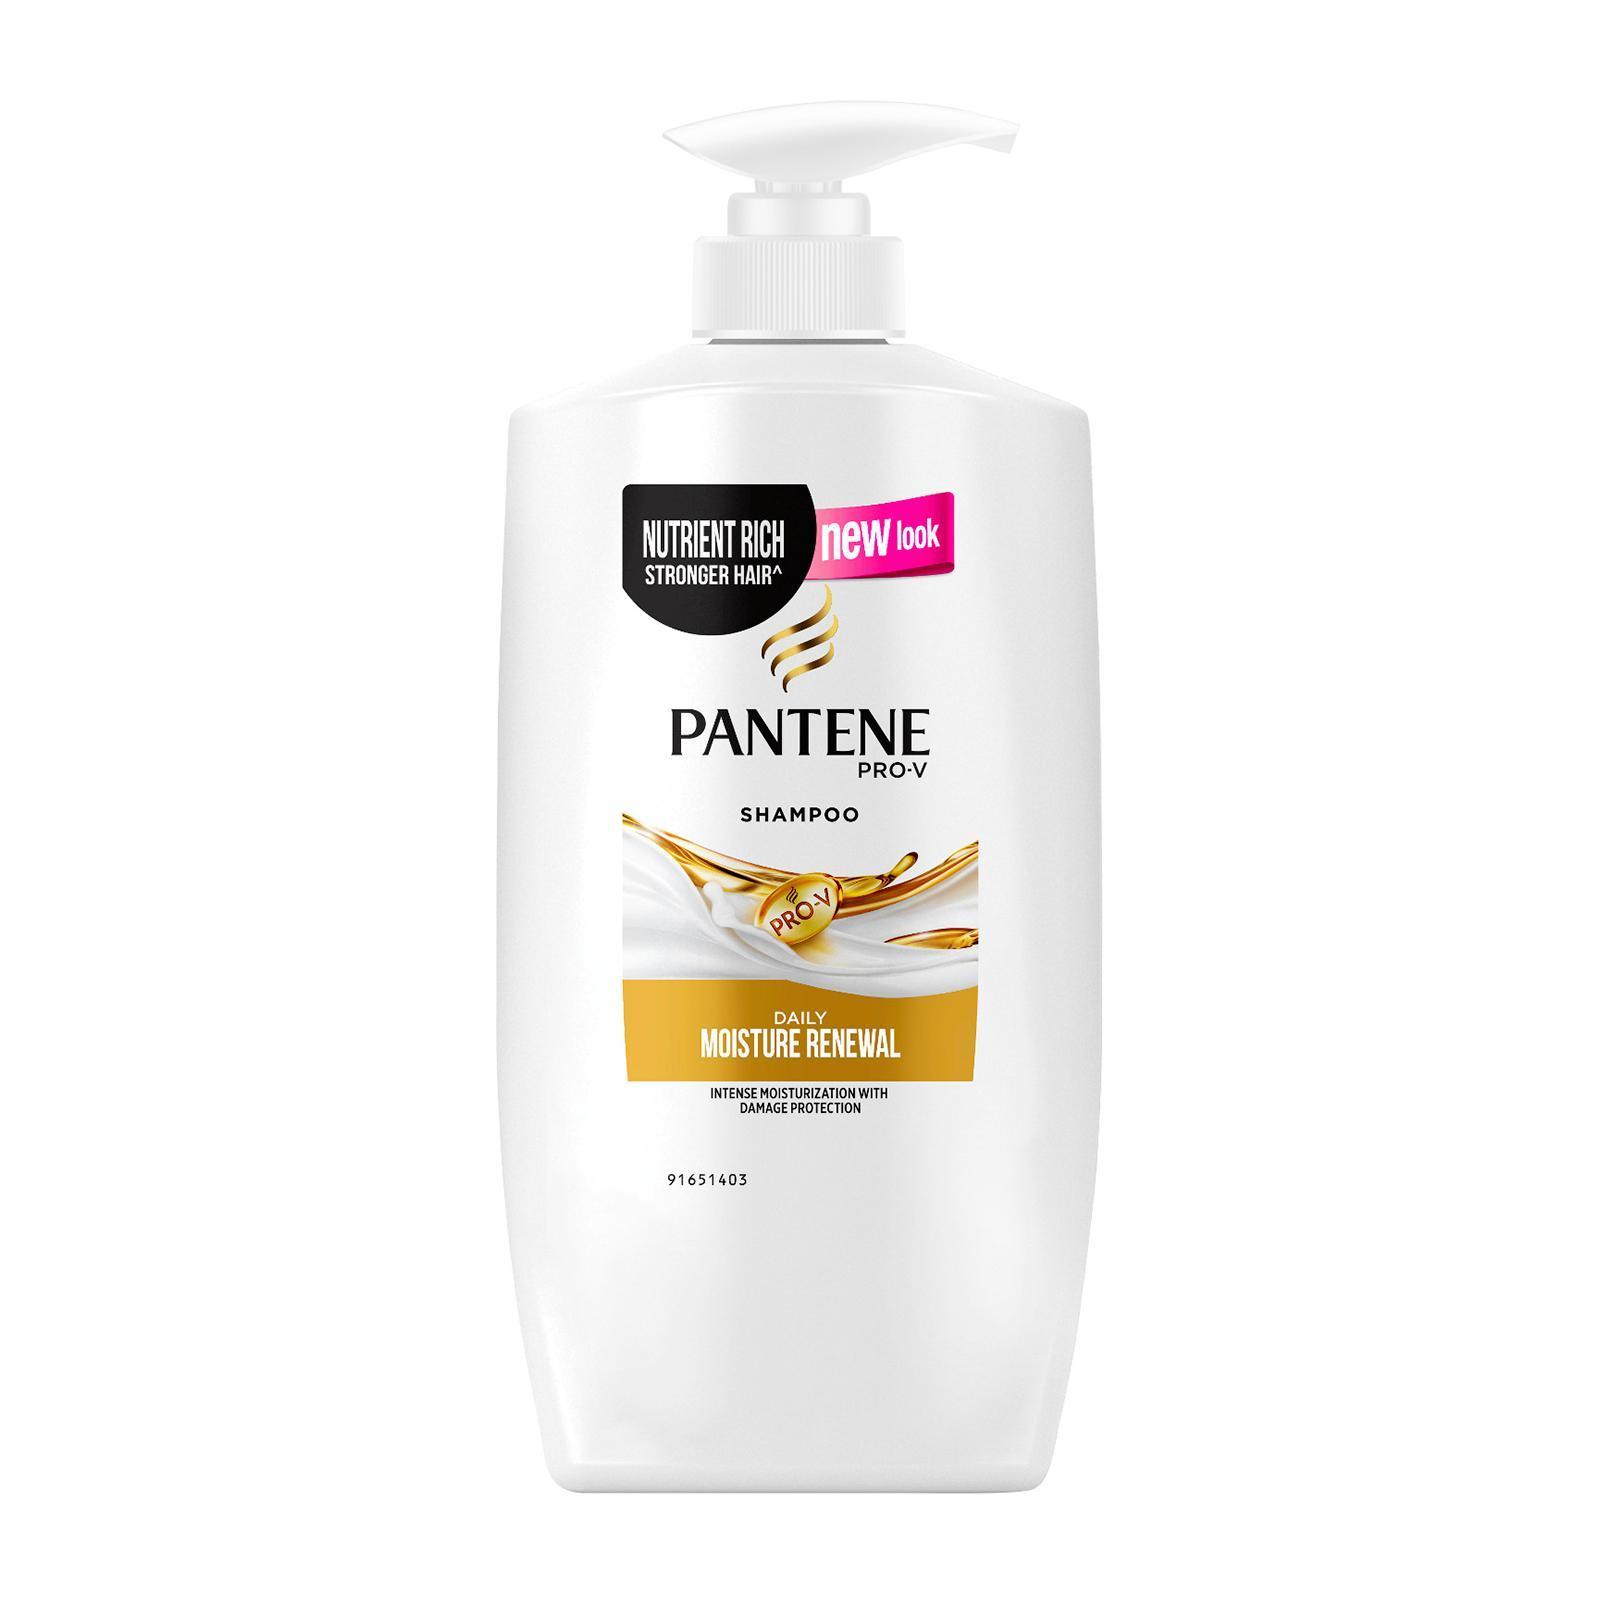 PANTENE pro v daily moisture renewal shampoo 750ml